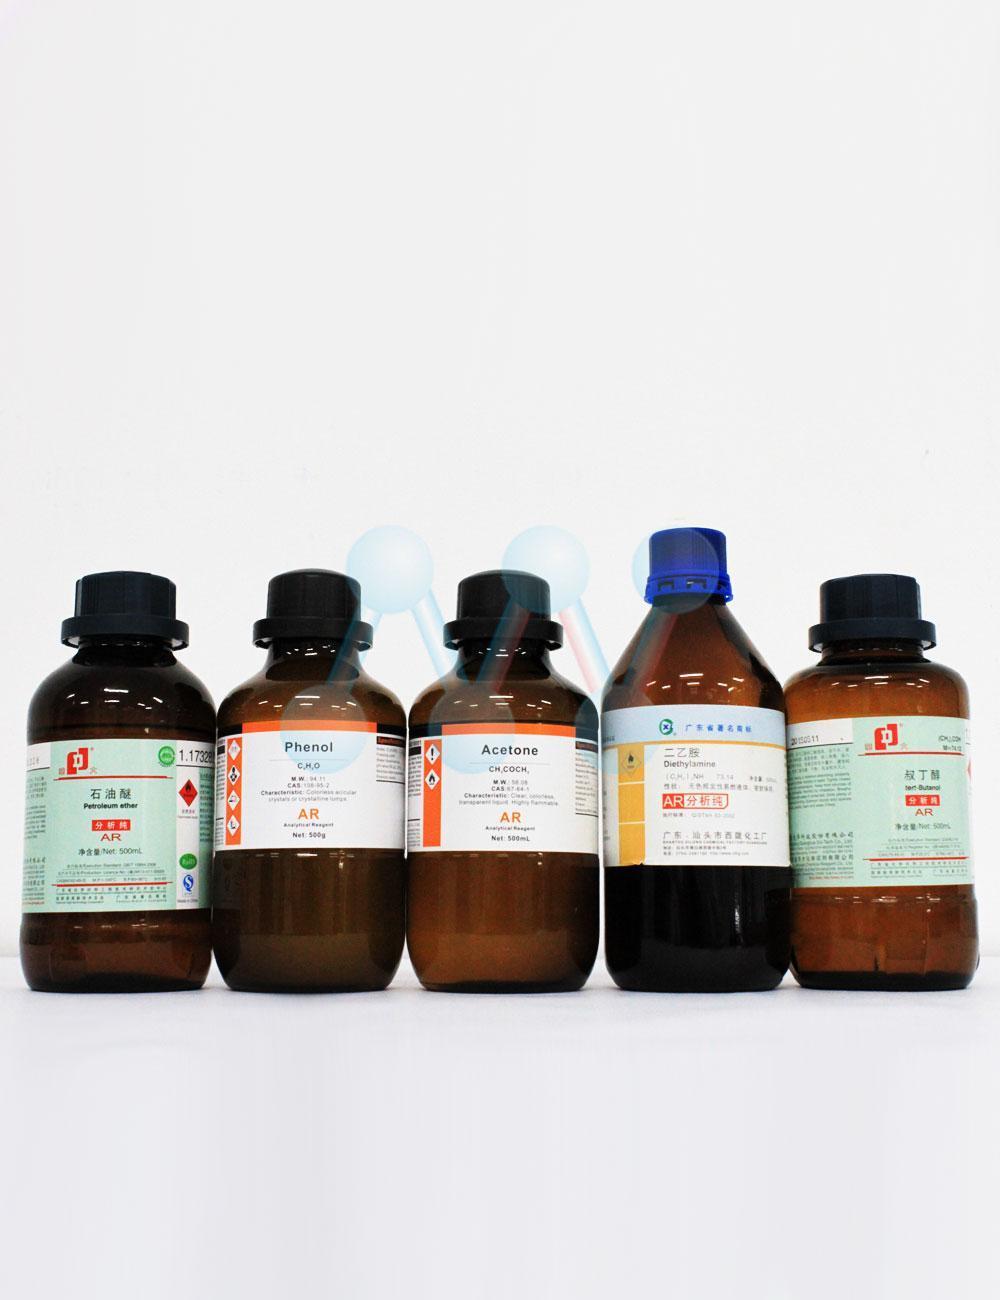 Iso Propanol (Iso Propyl alcohol) (CH3)2CHOH